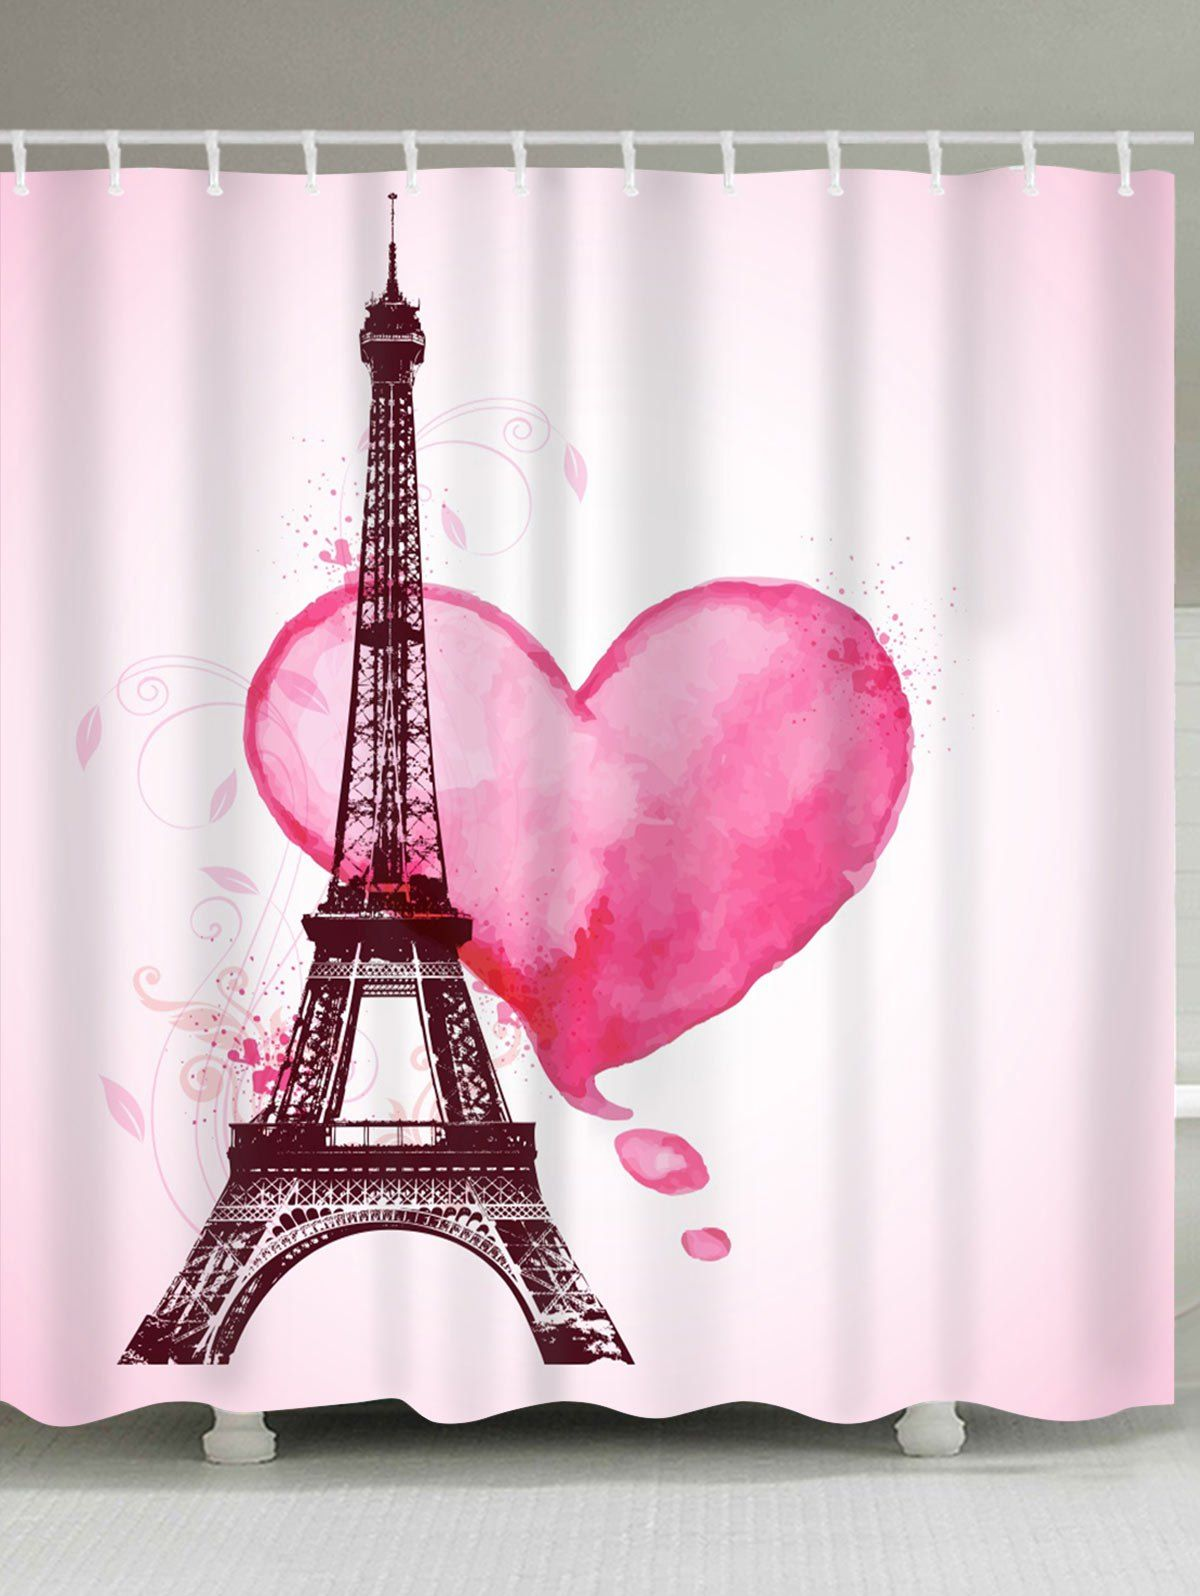 24 Tela para cortina de bano parisina